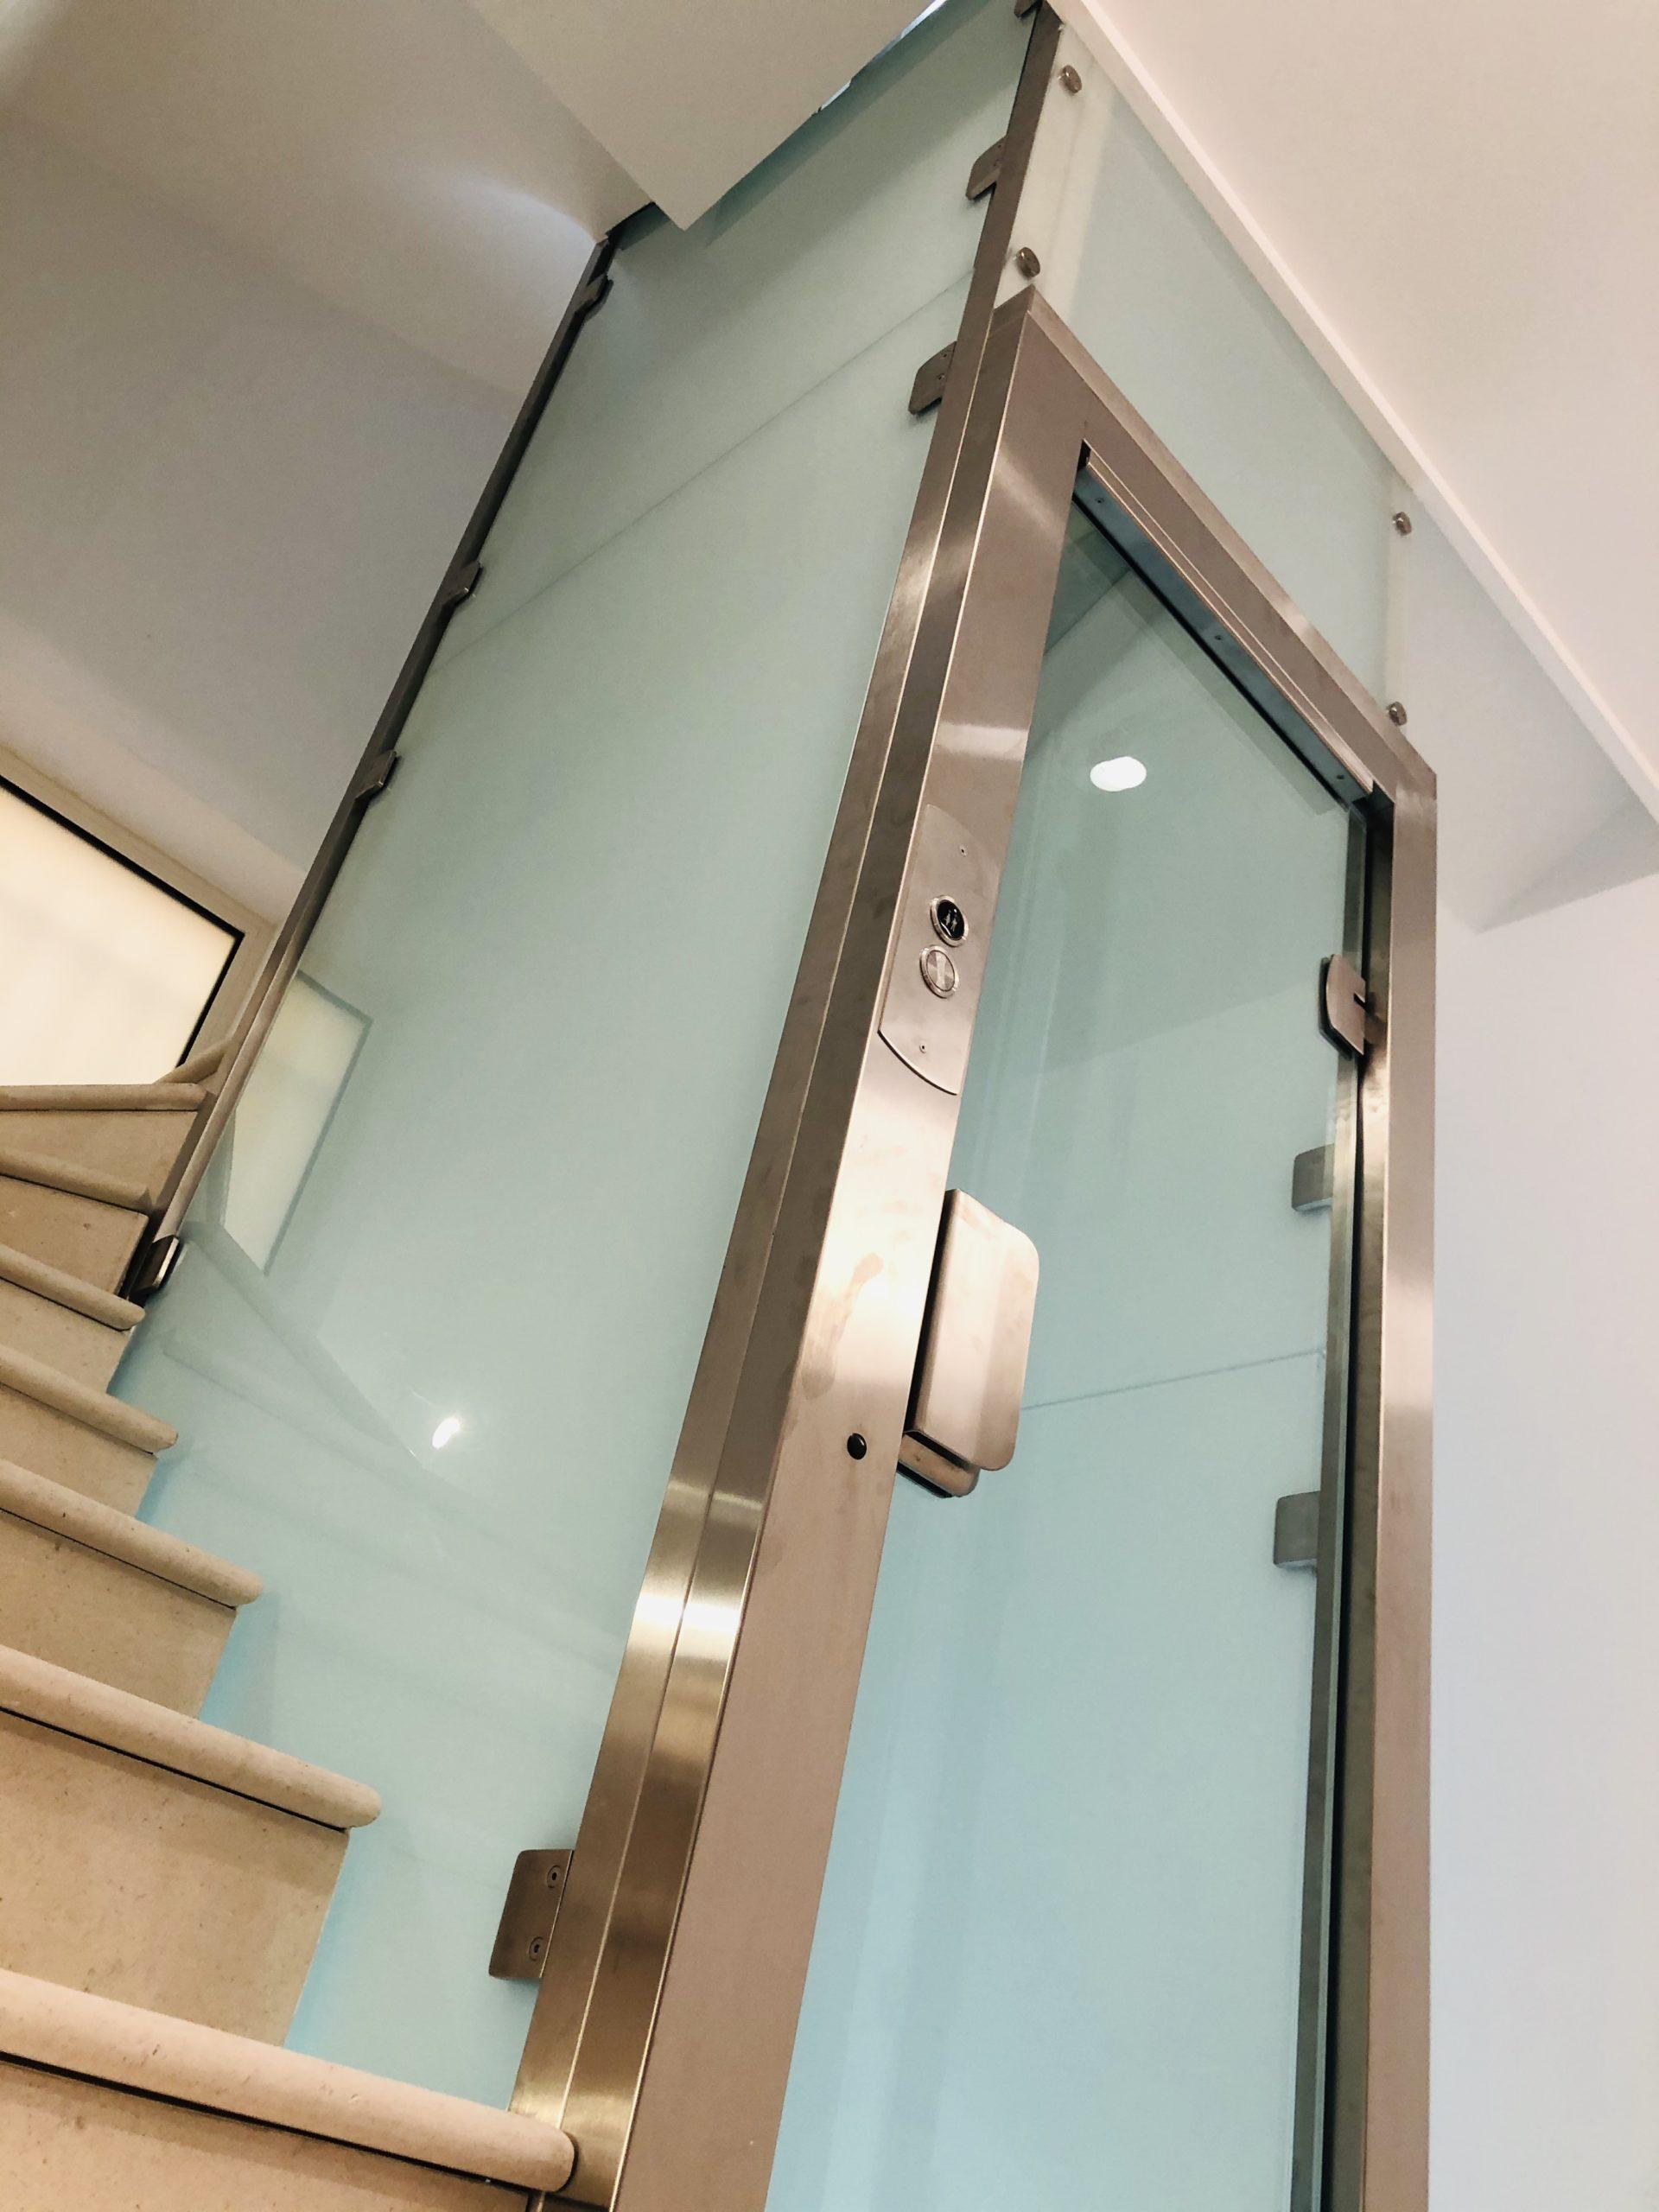 ascenseur habillage verre